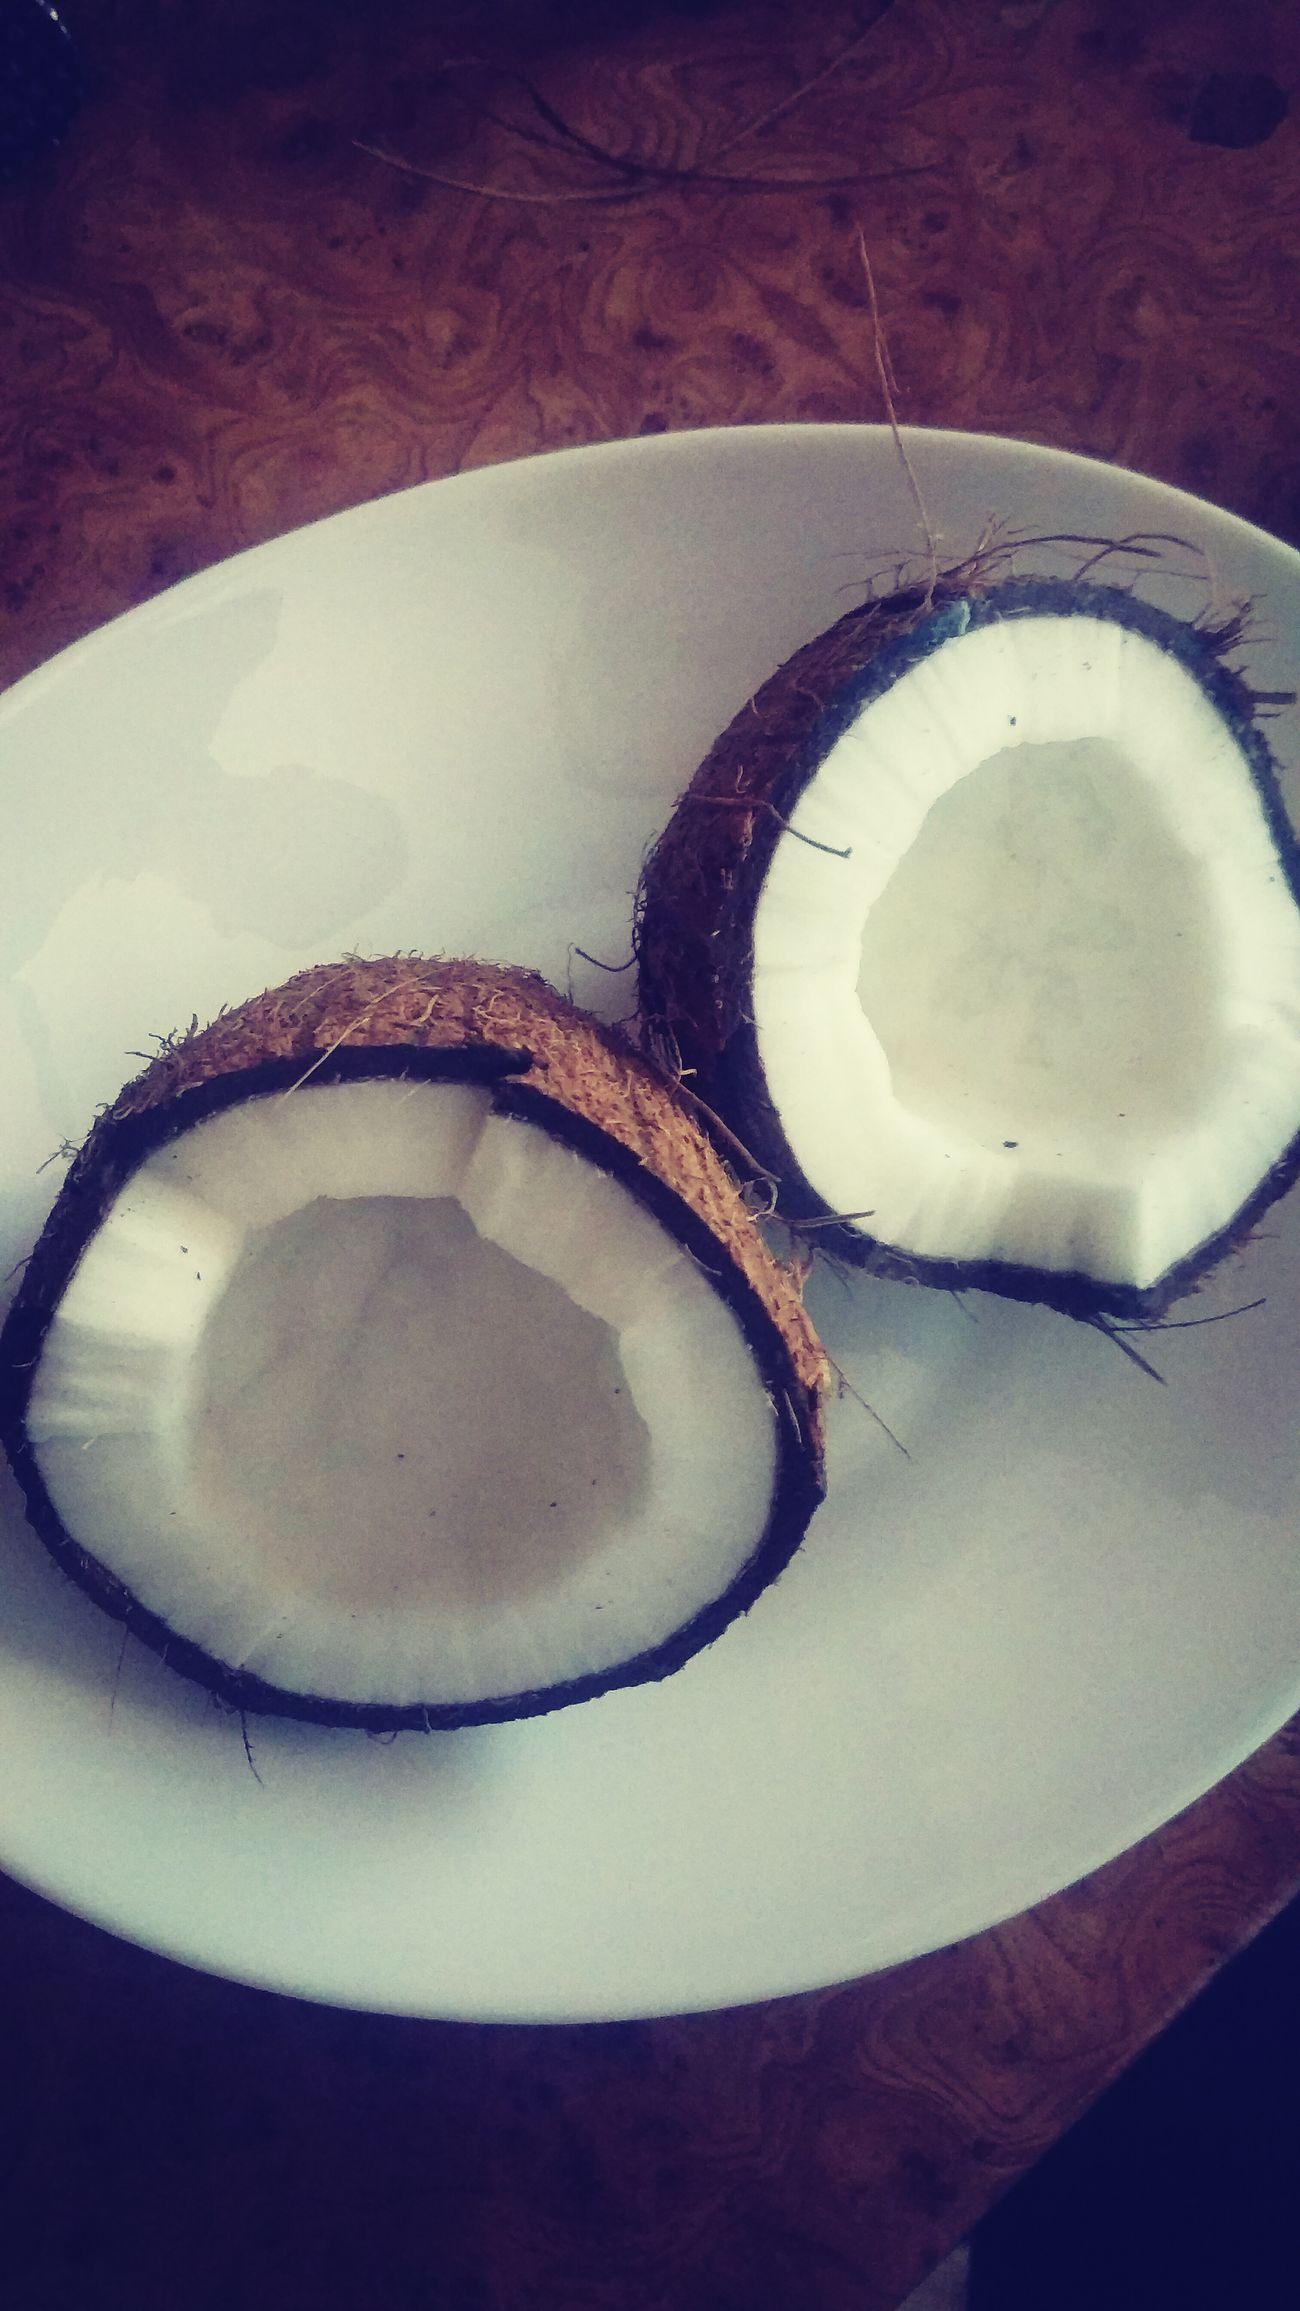 Healthy Eating Sweet Food Baking Pan First Eyeem Photo